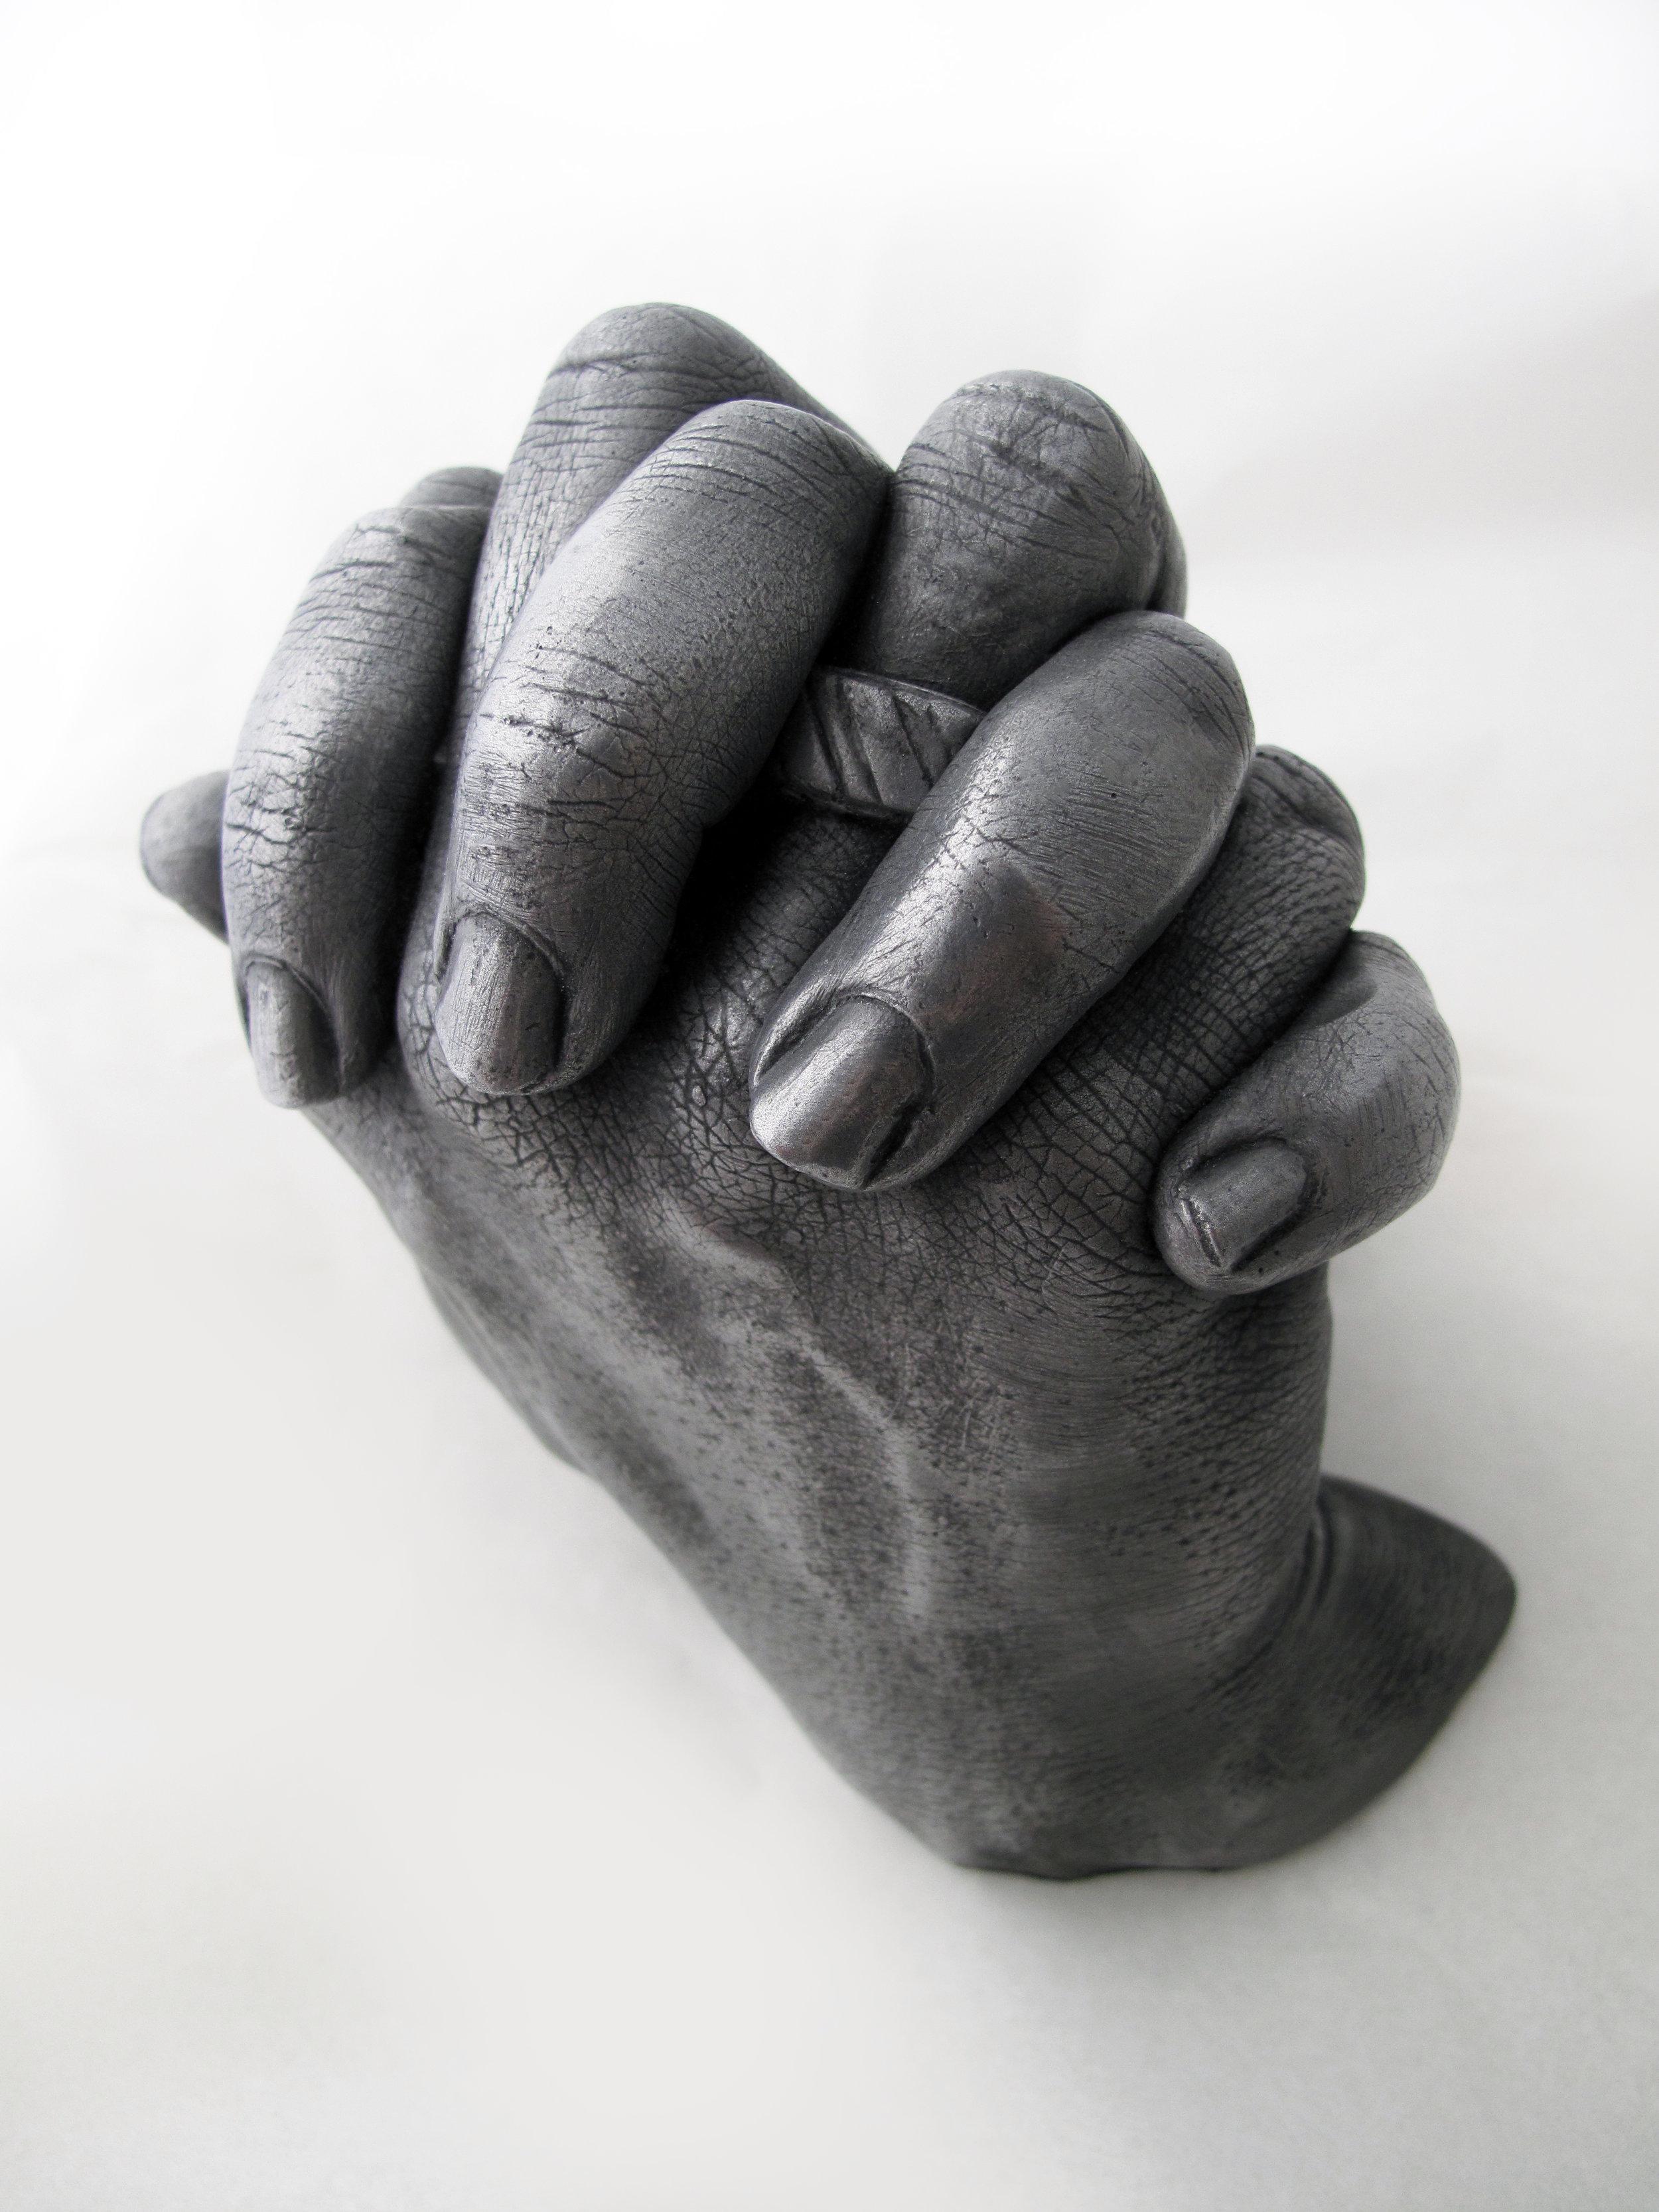 aluminium hand cast.jpg